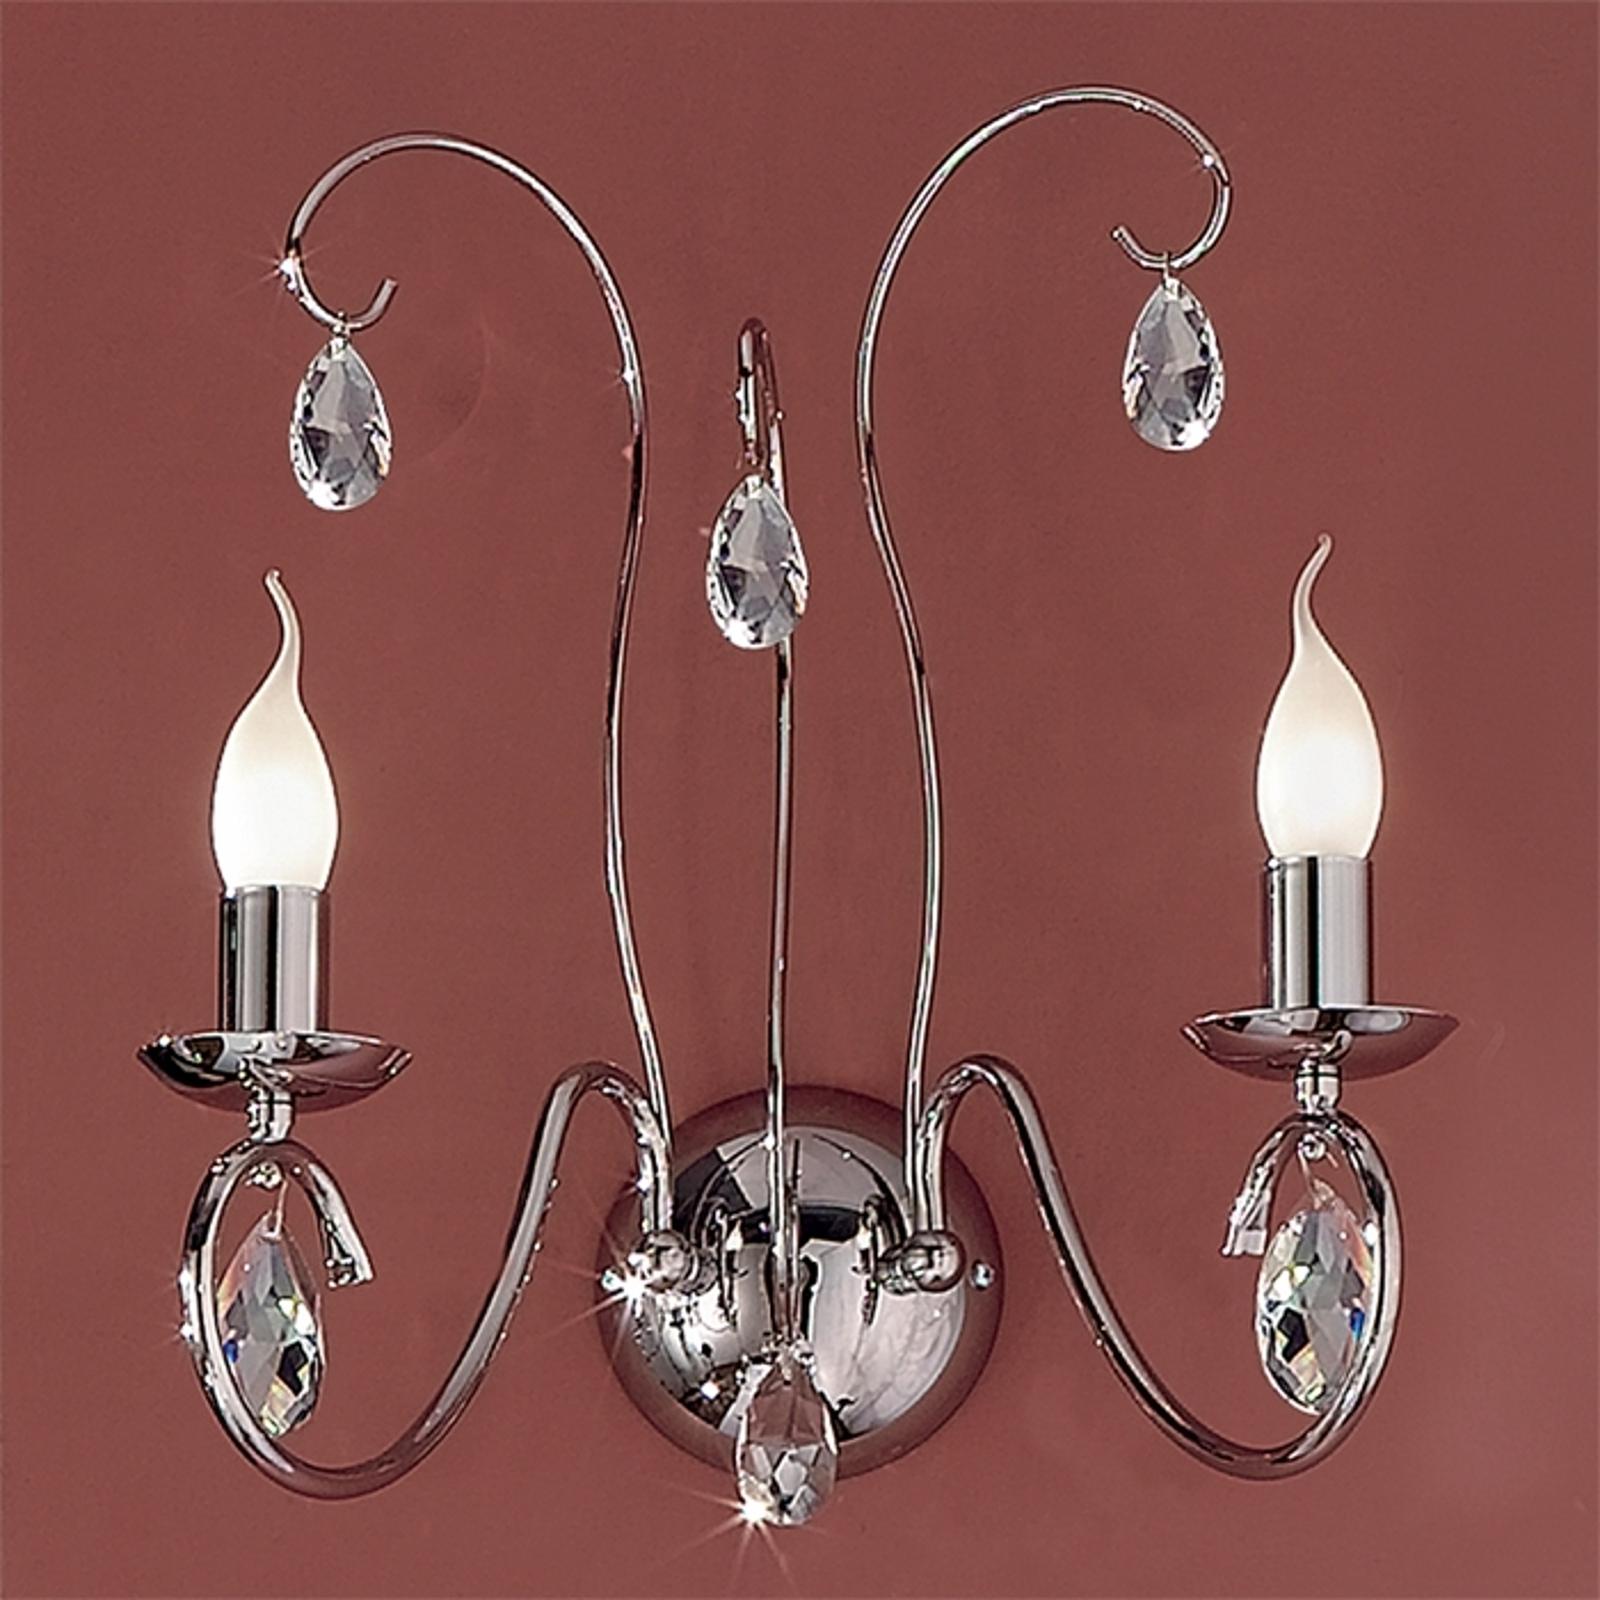 Sierlijke wandlamp FIORETTO 2 l., chroom